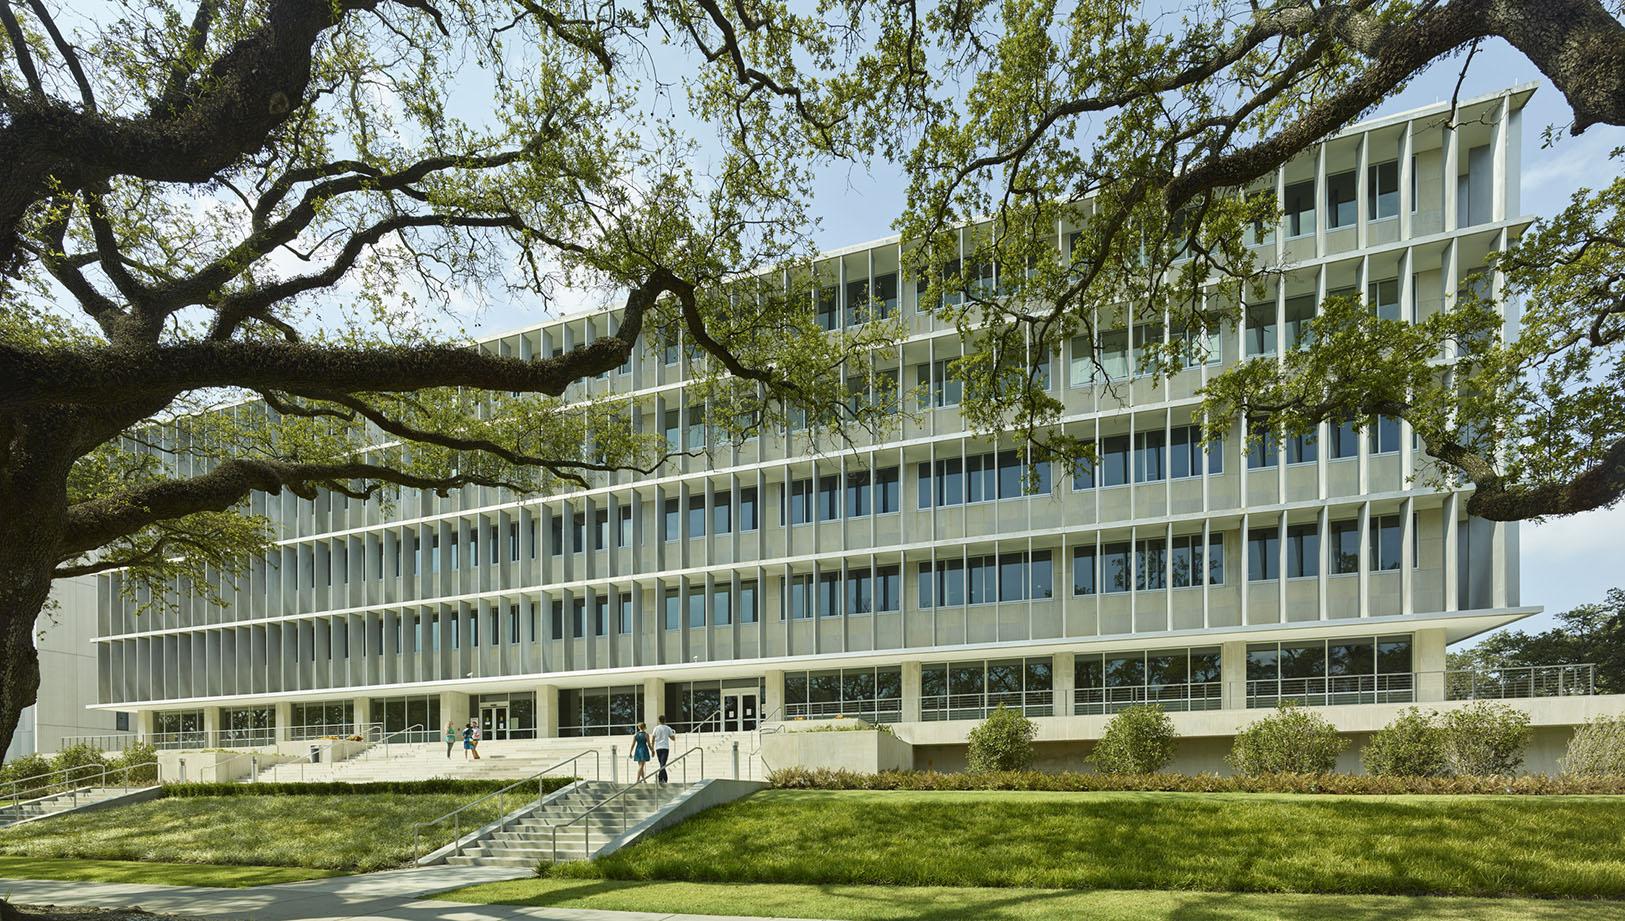 Figure       SEQ Figure \* ARABIC     5:        Exterior, the Pan American Life Building (now the New Orleans VA Hospital Administration Building), post renovation (2014). Photographer: Tim Hursley